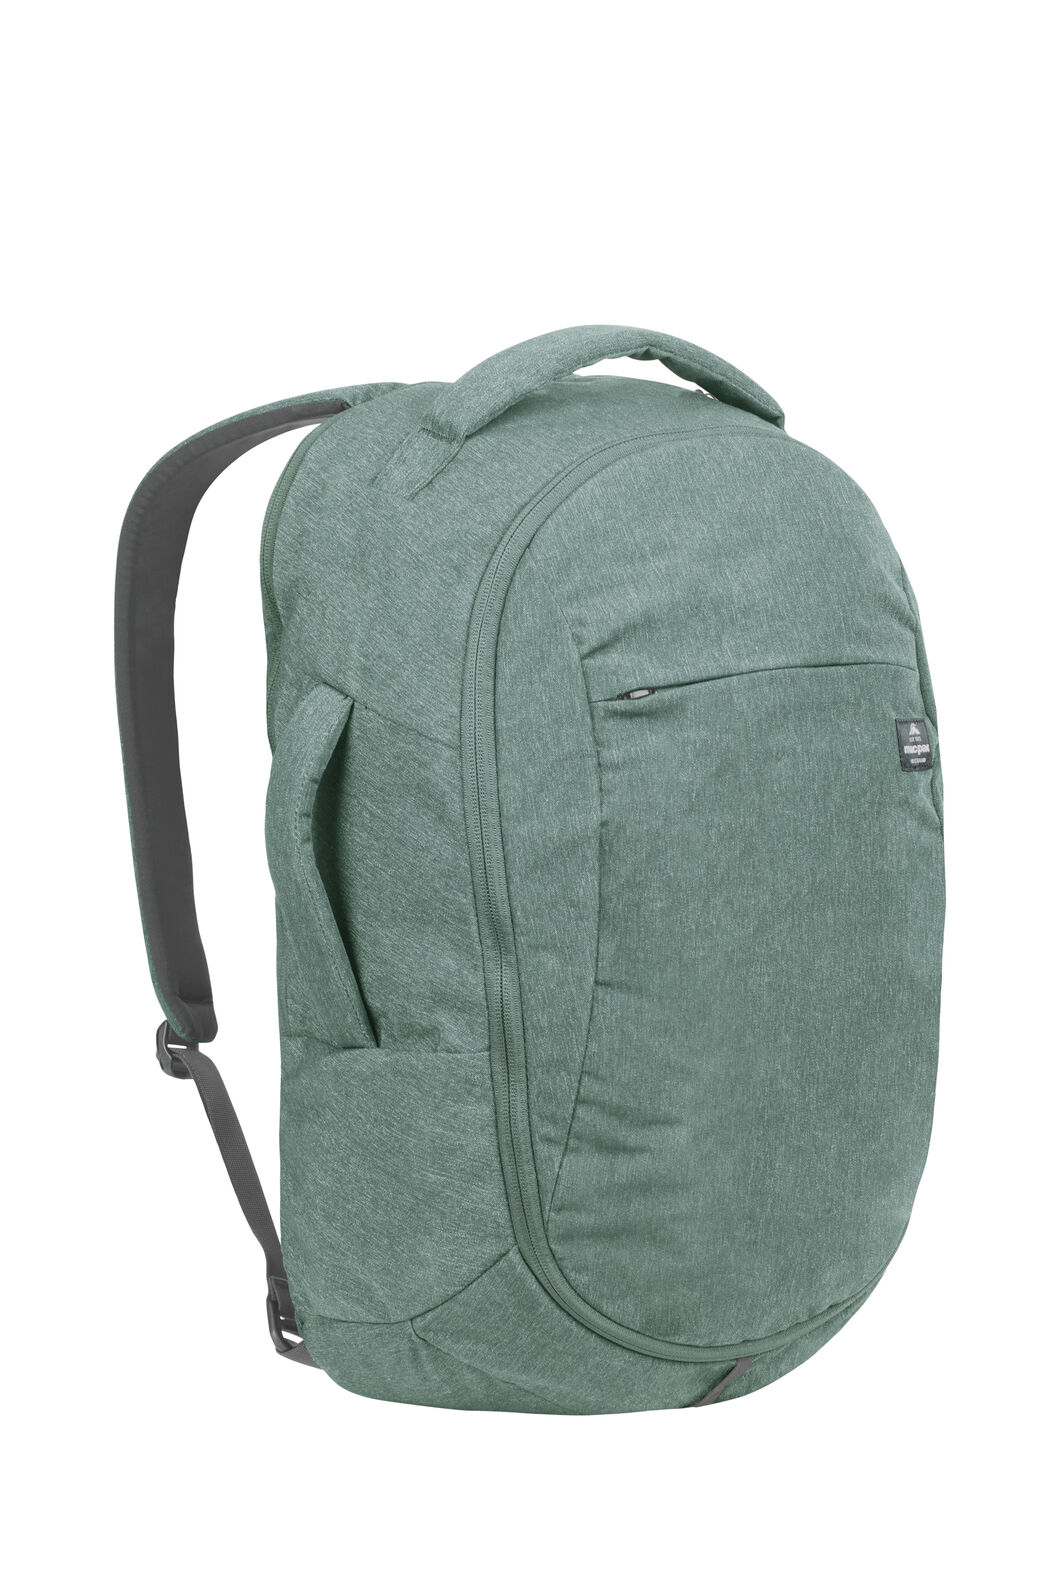 Macpac UTSIFOY 1.1 25L Backpack, Stormy Sea, hi-res